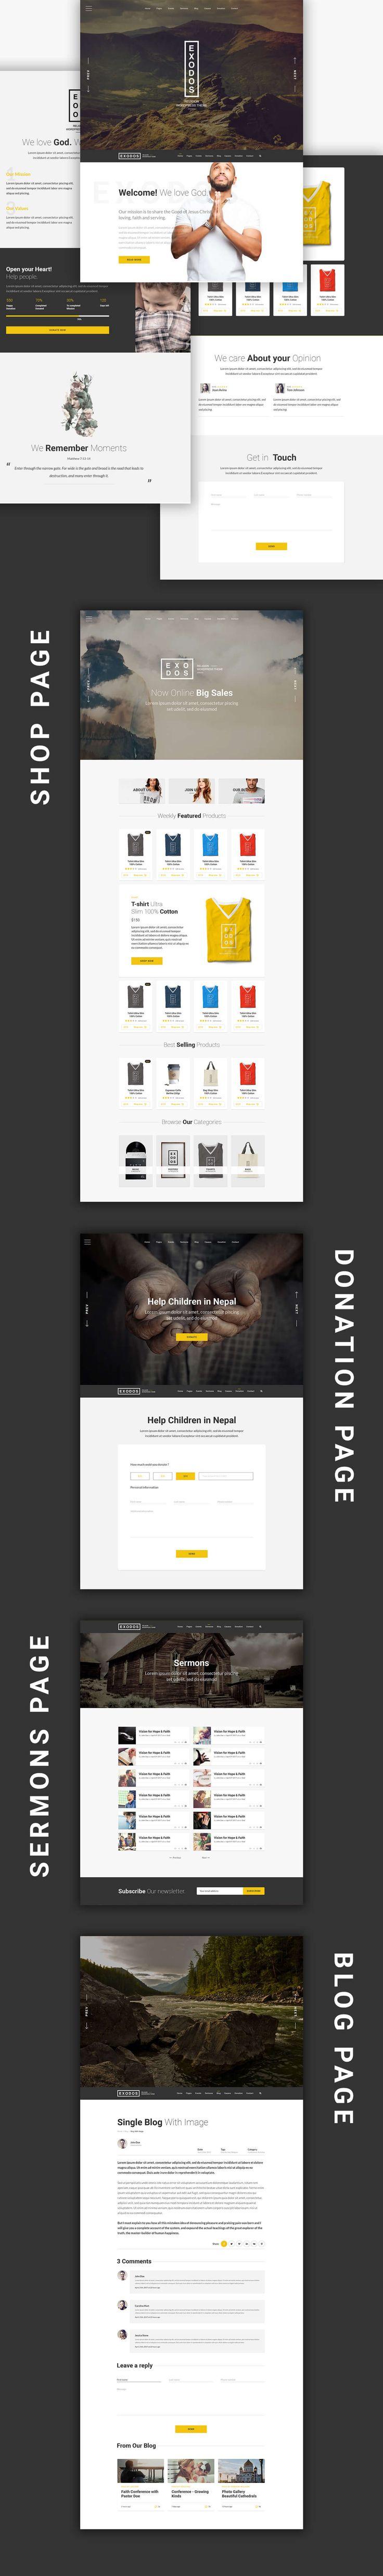 Exodos - Church WordPress Theme by modeltheme   ThemeForest